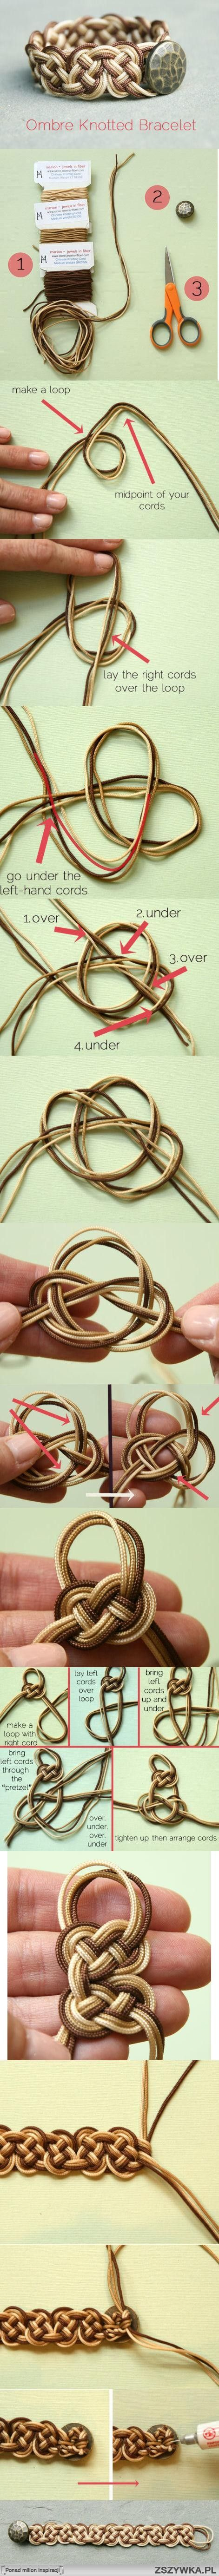 ohttps://www.facebook.com/pages/Arte-com-Arte/138933112886053?fref=tsmbre celtic knot bracelet